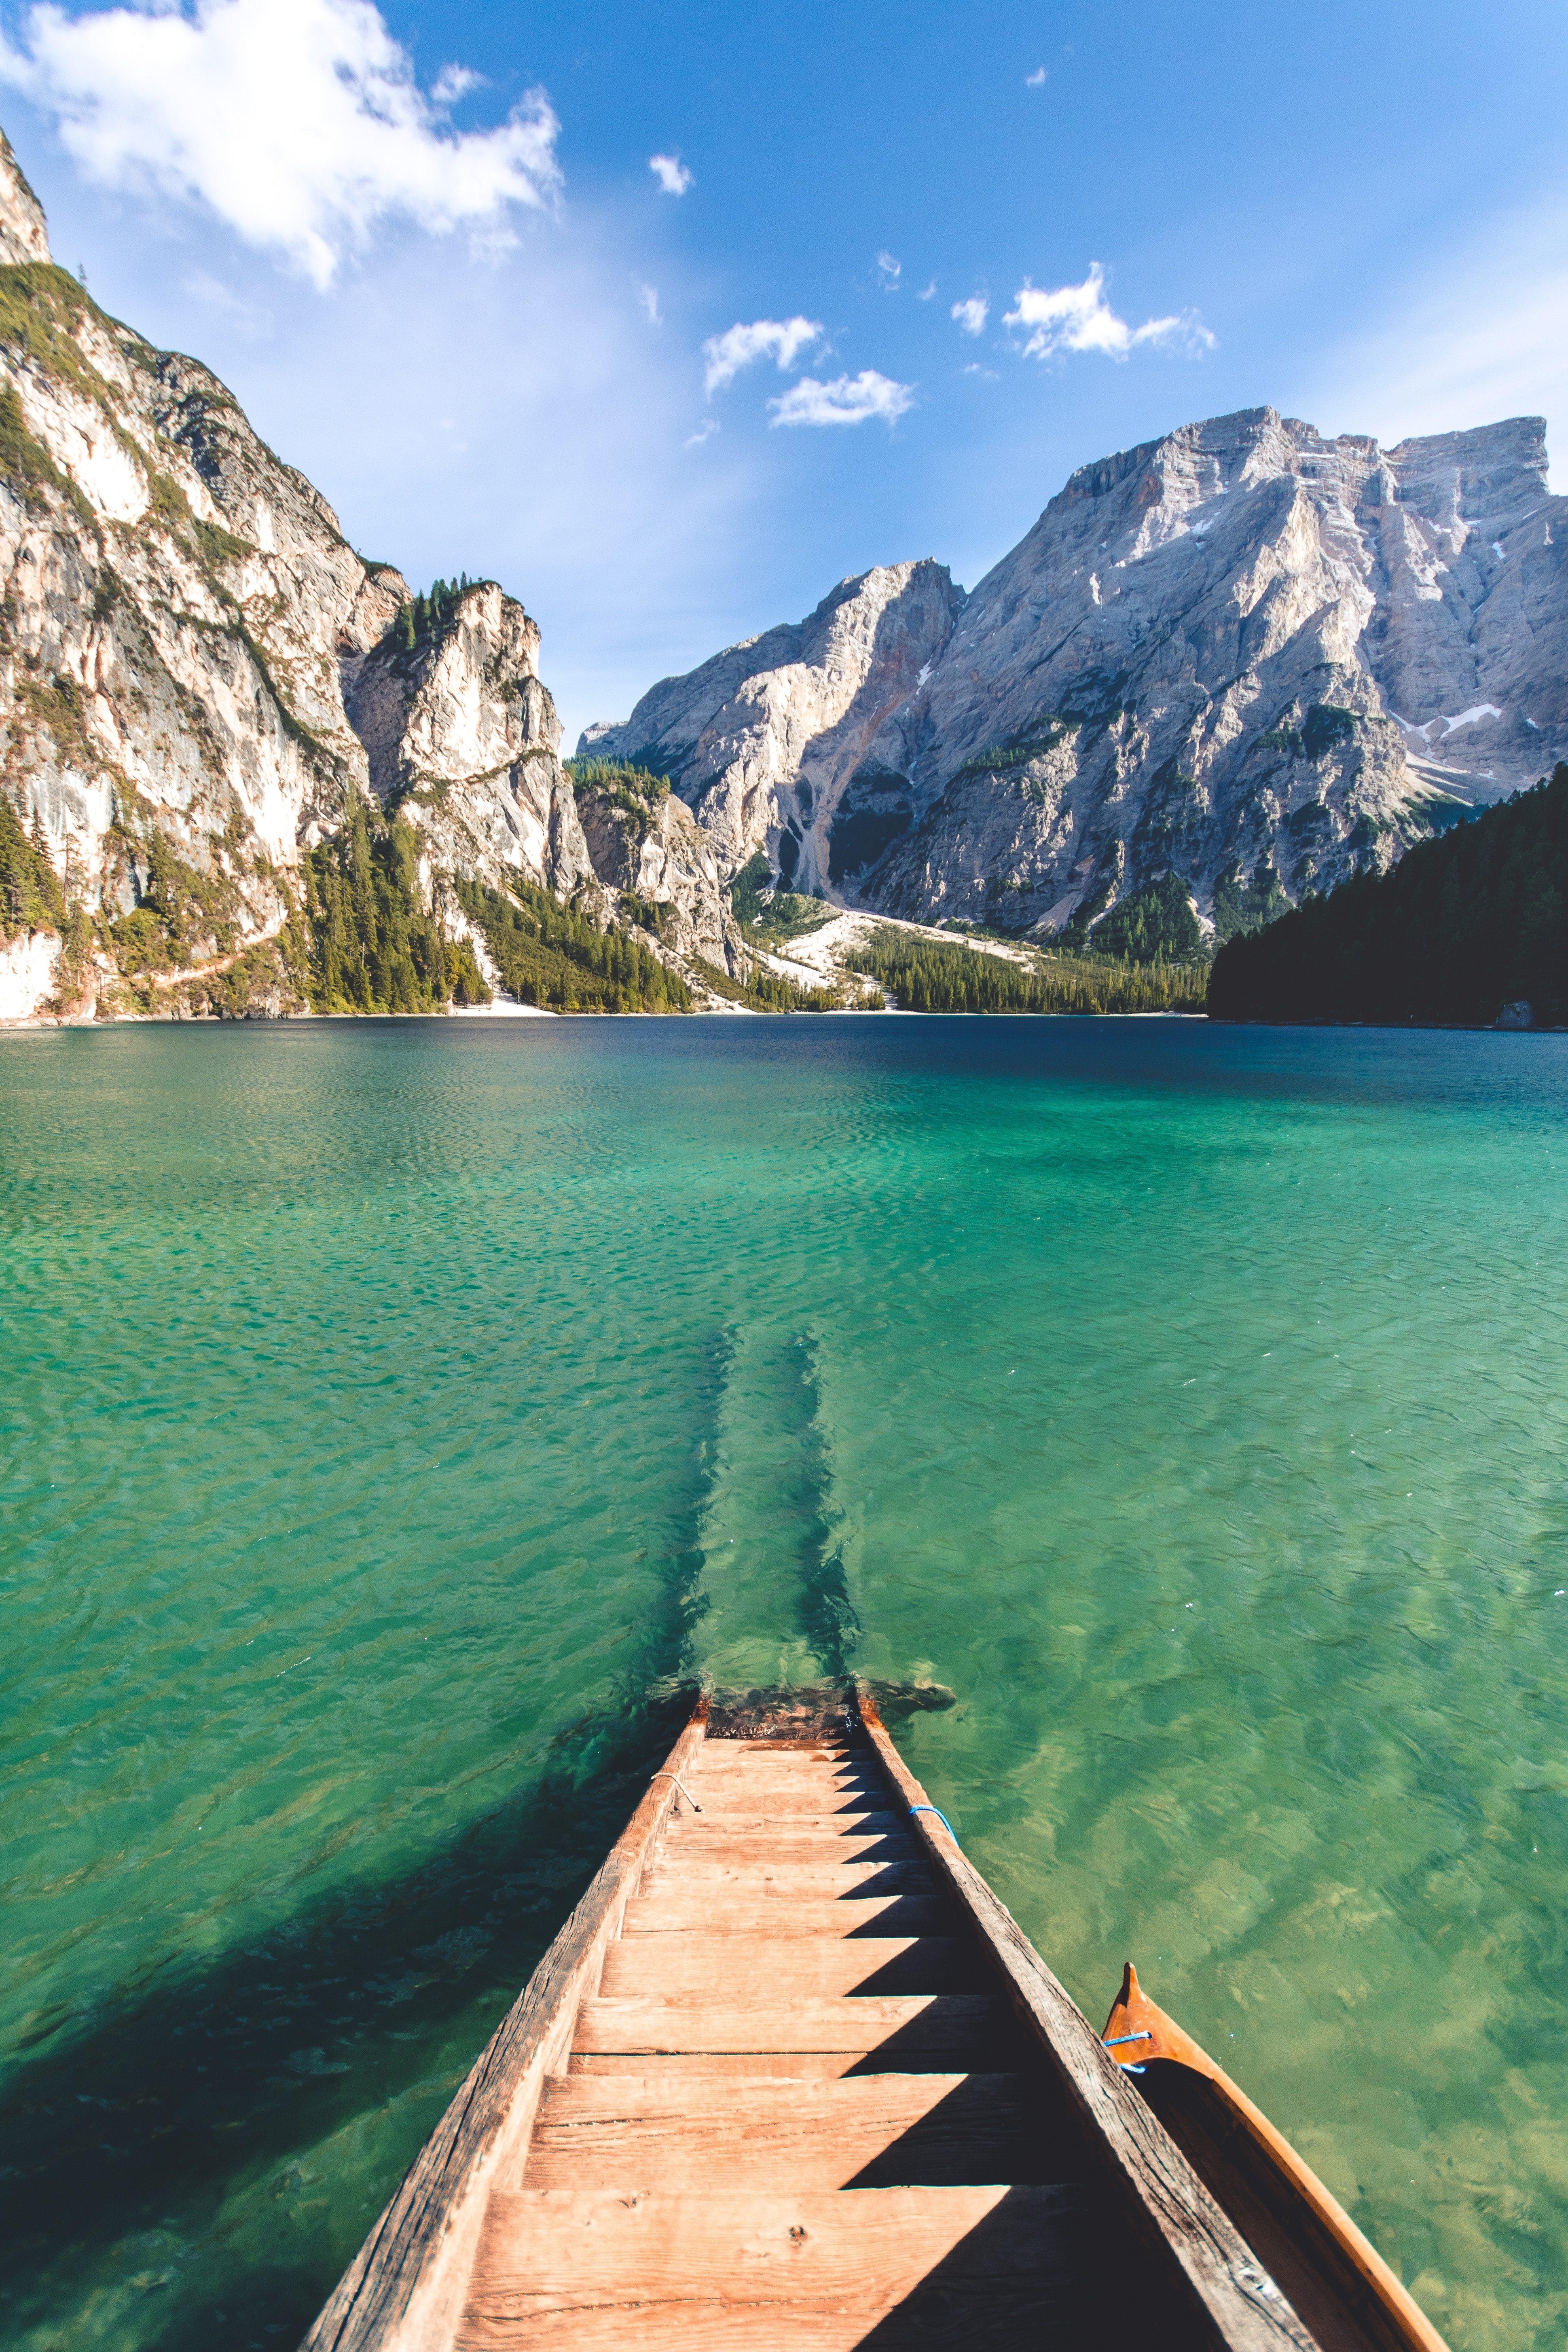 Mountain Lake Sky Iphone Wallpaper Idrop News